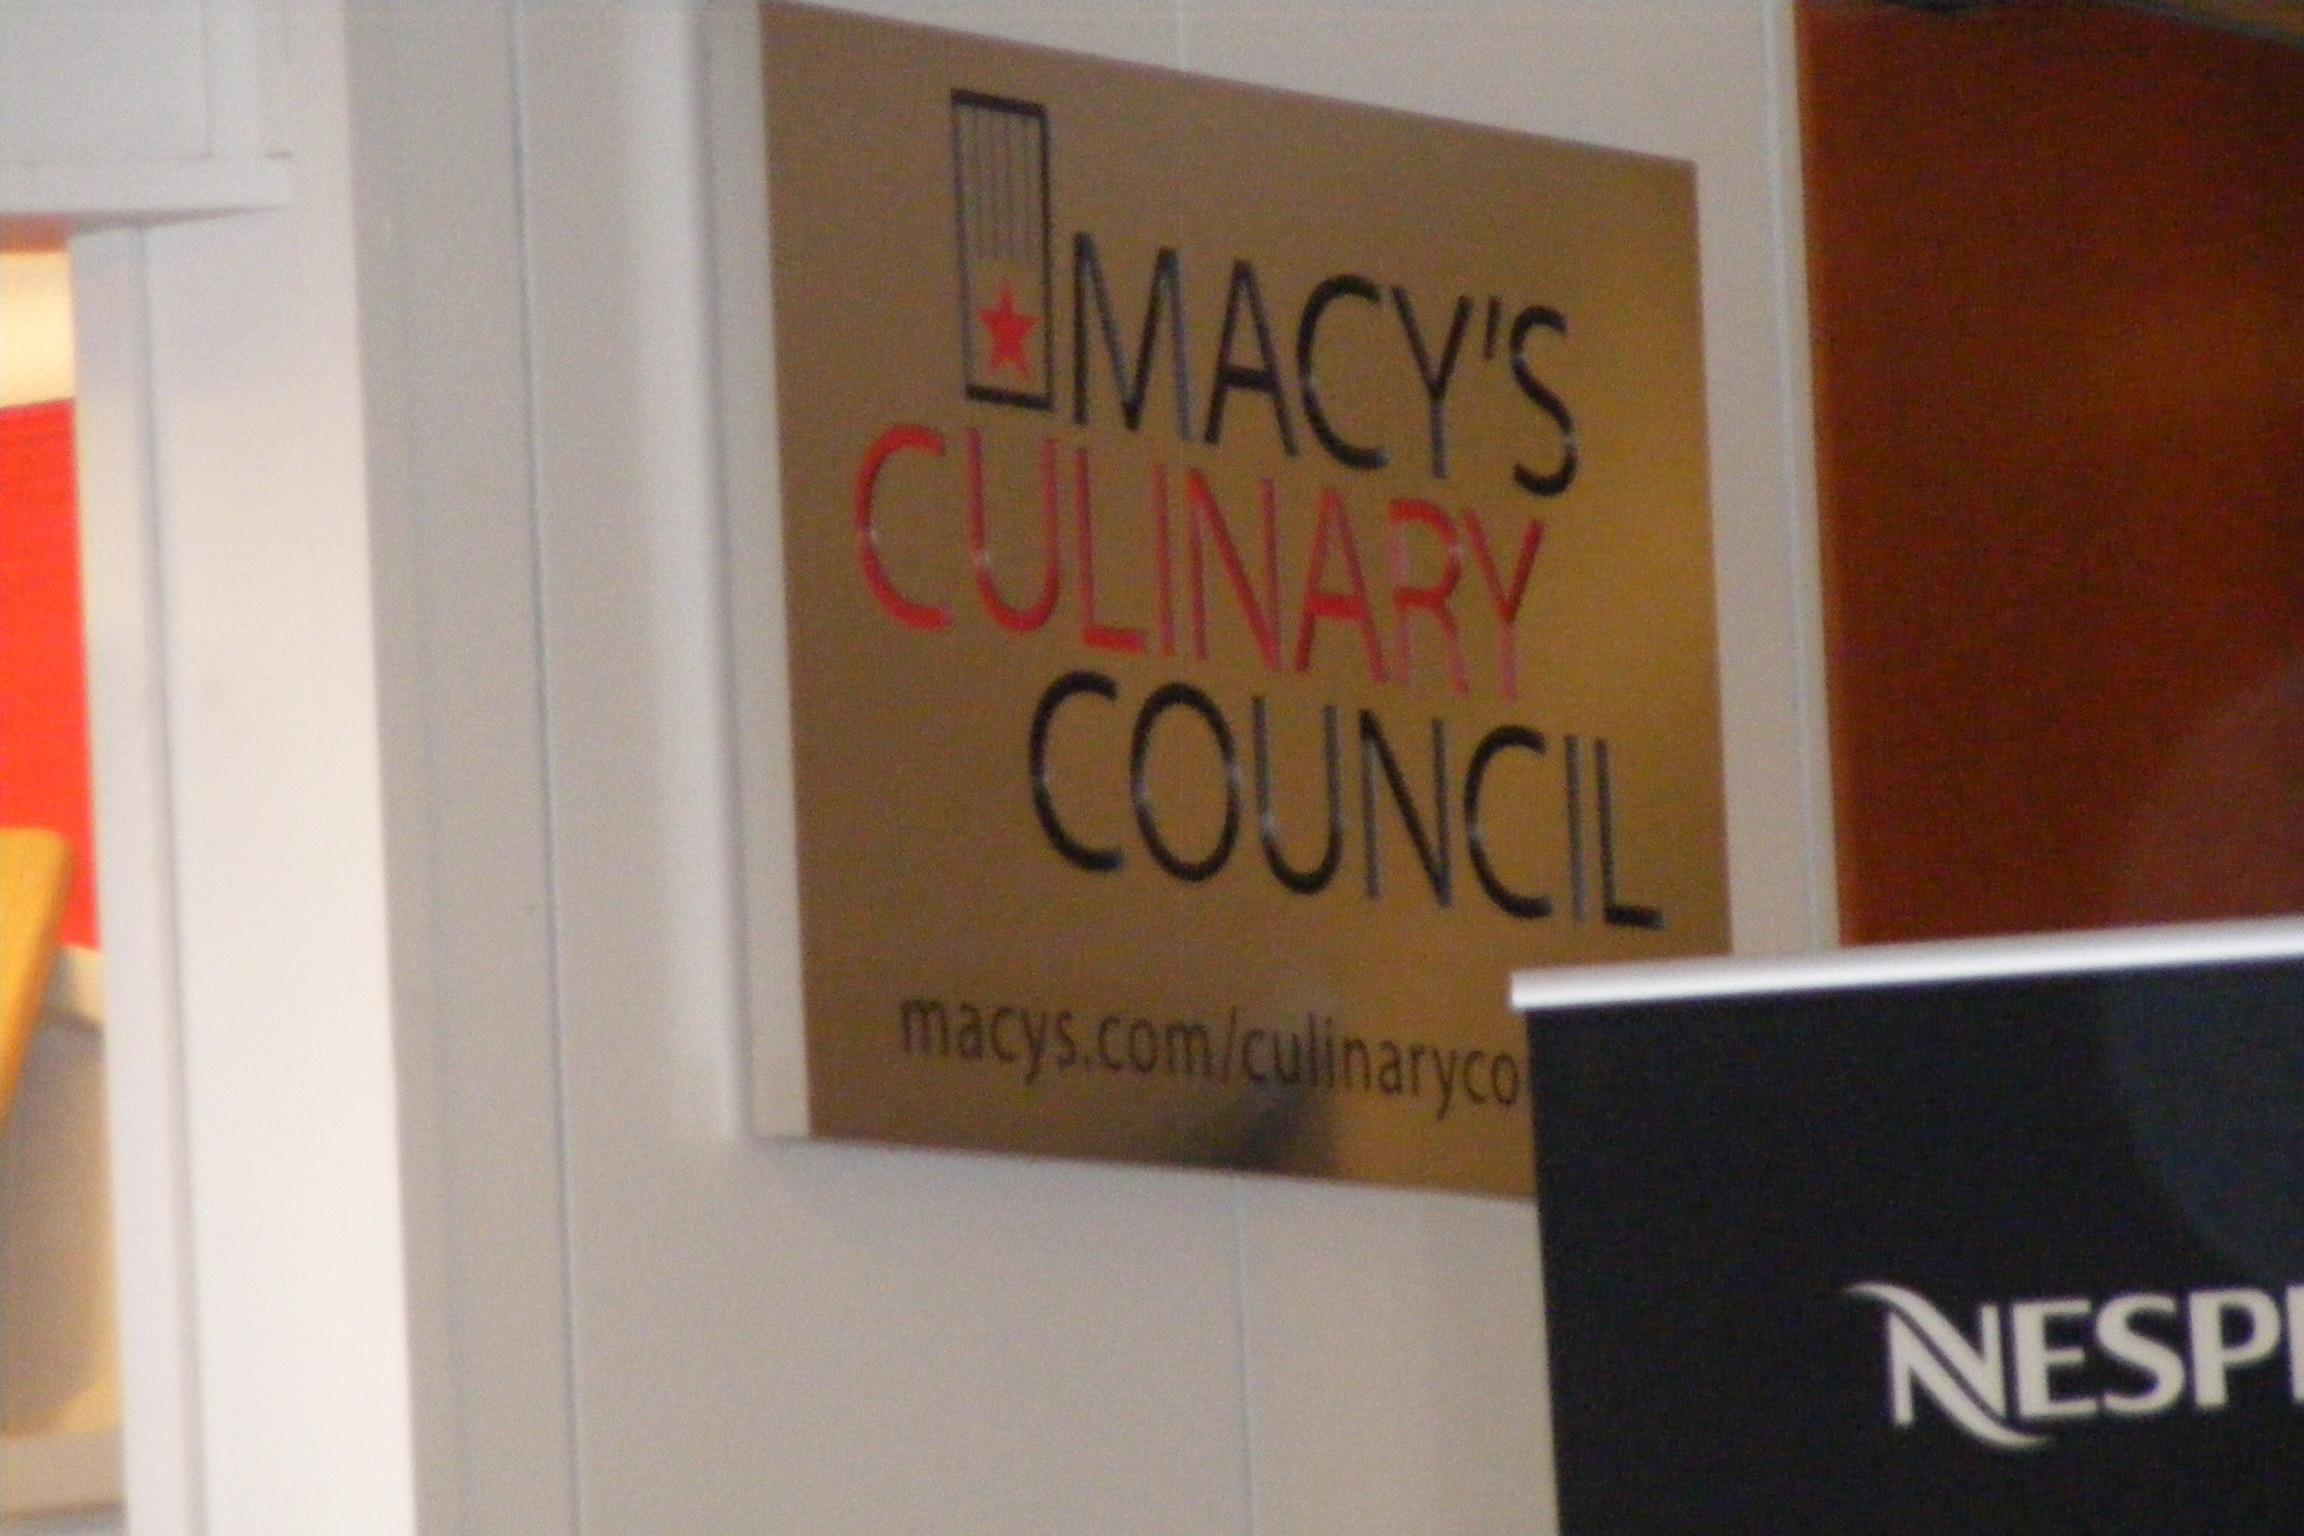 macys nespresso classy black girl culinary council